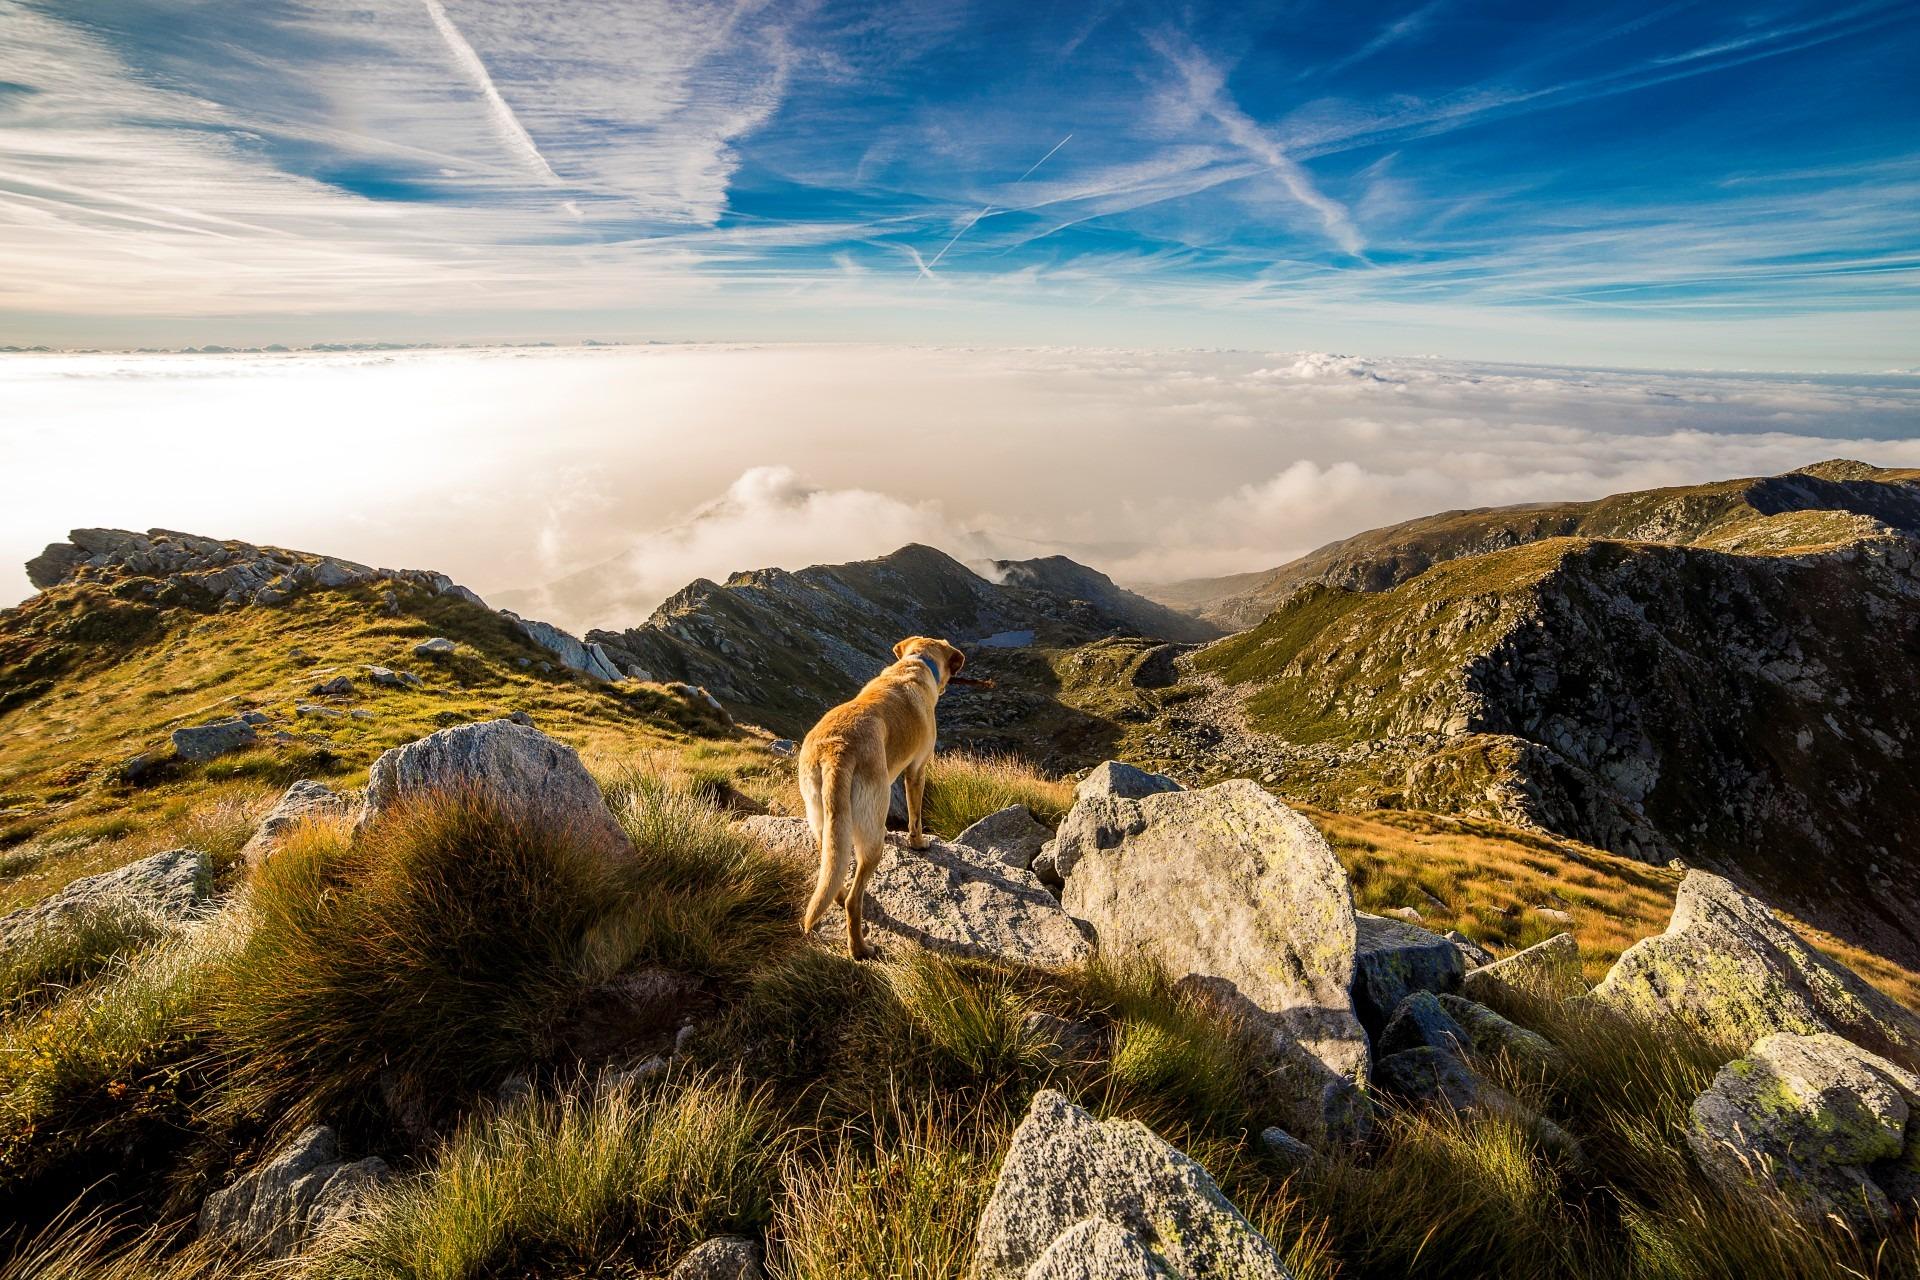 dog-mountain-mombarone-clouds-65867